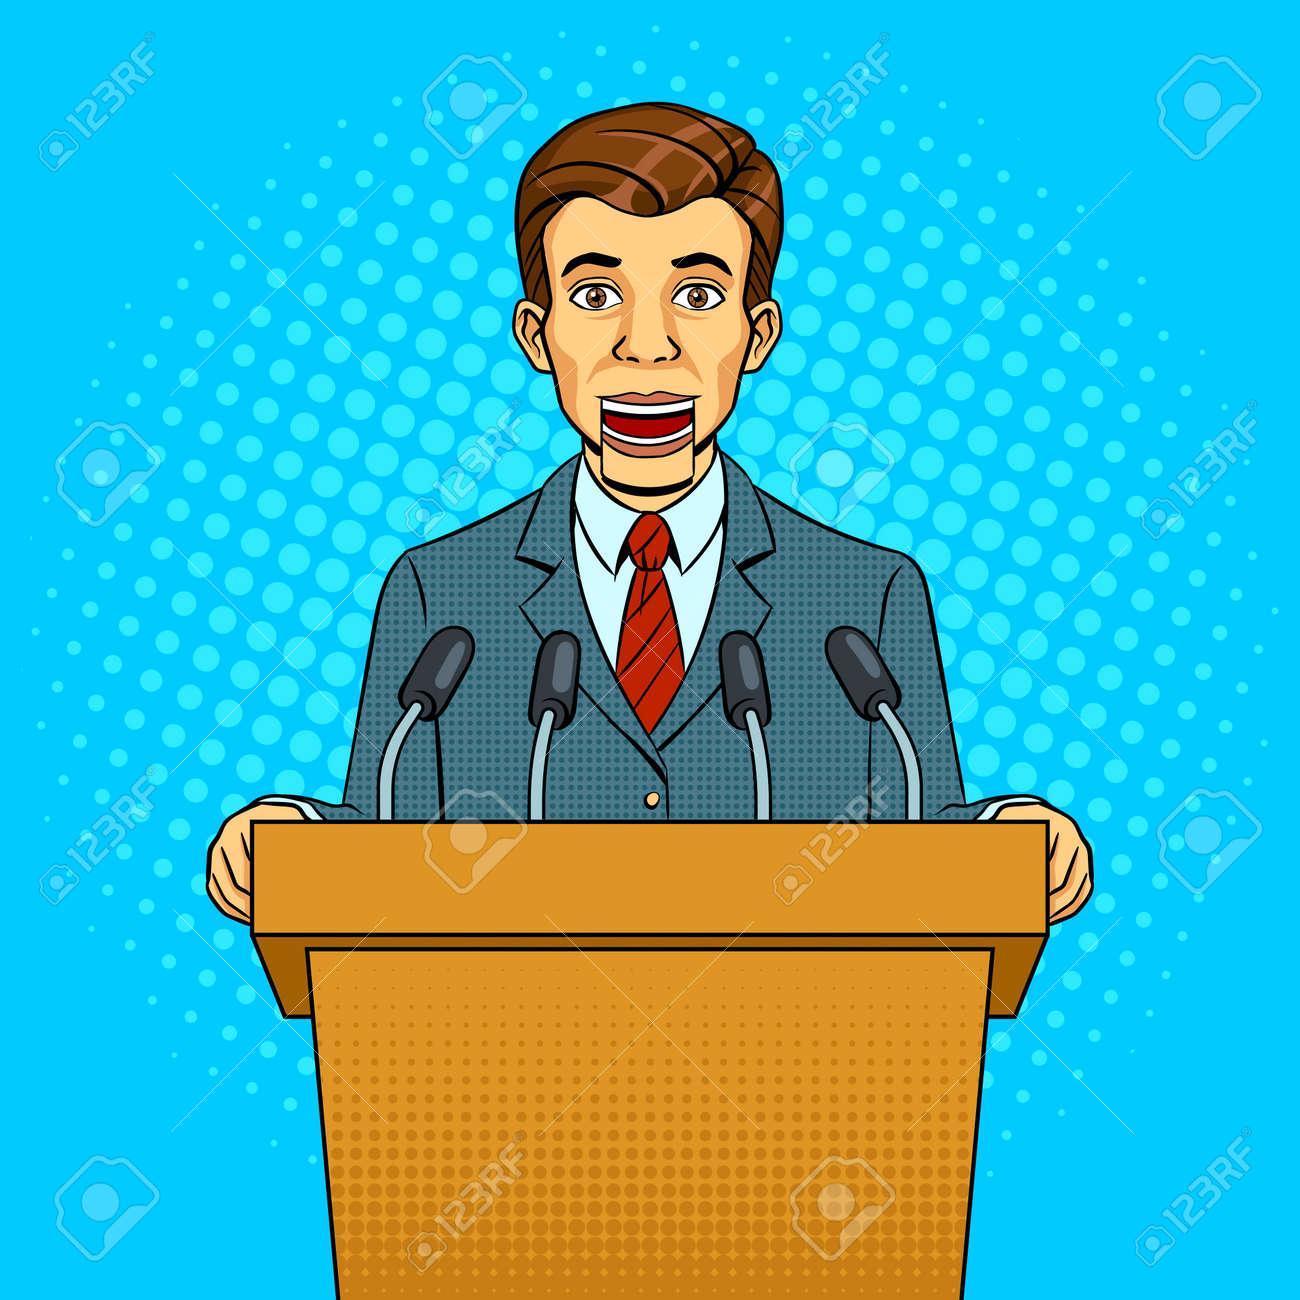 Speaking puppet on tribune - 95372565